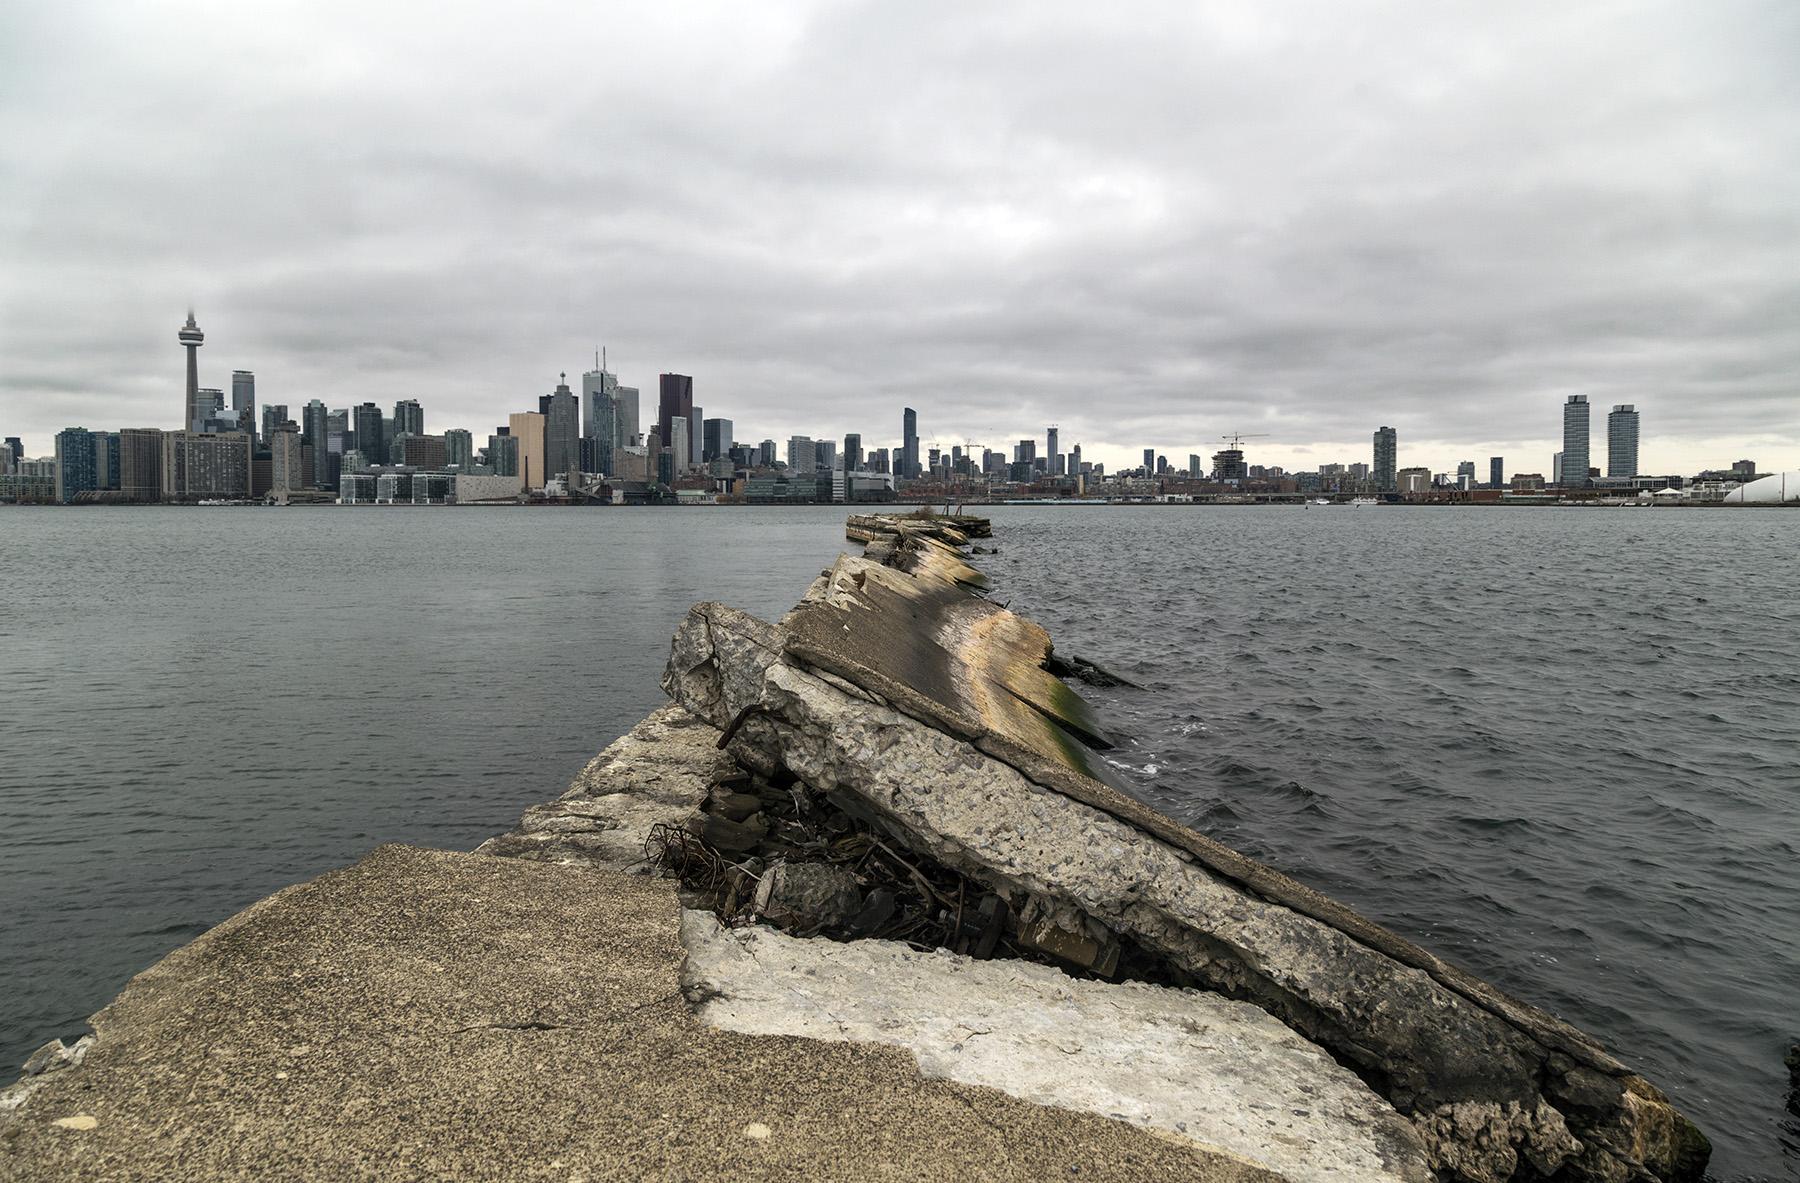 20151228. Derelict concrete pier points to Toronto's skyline.